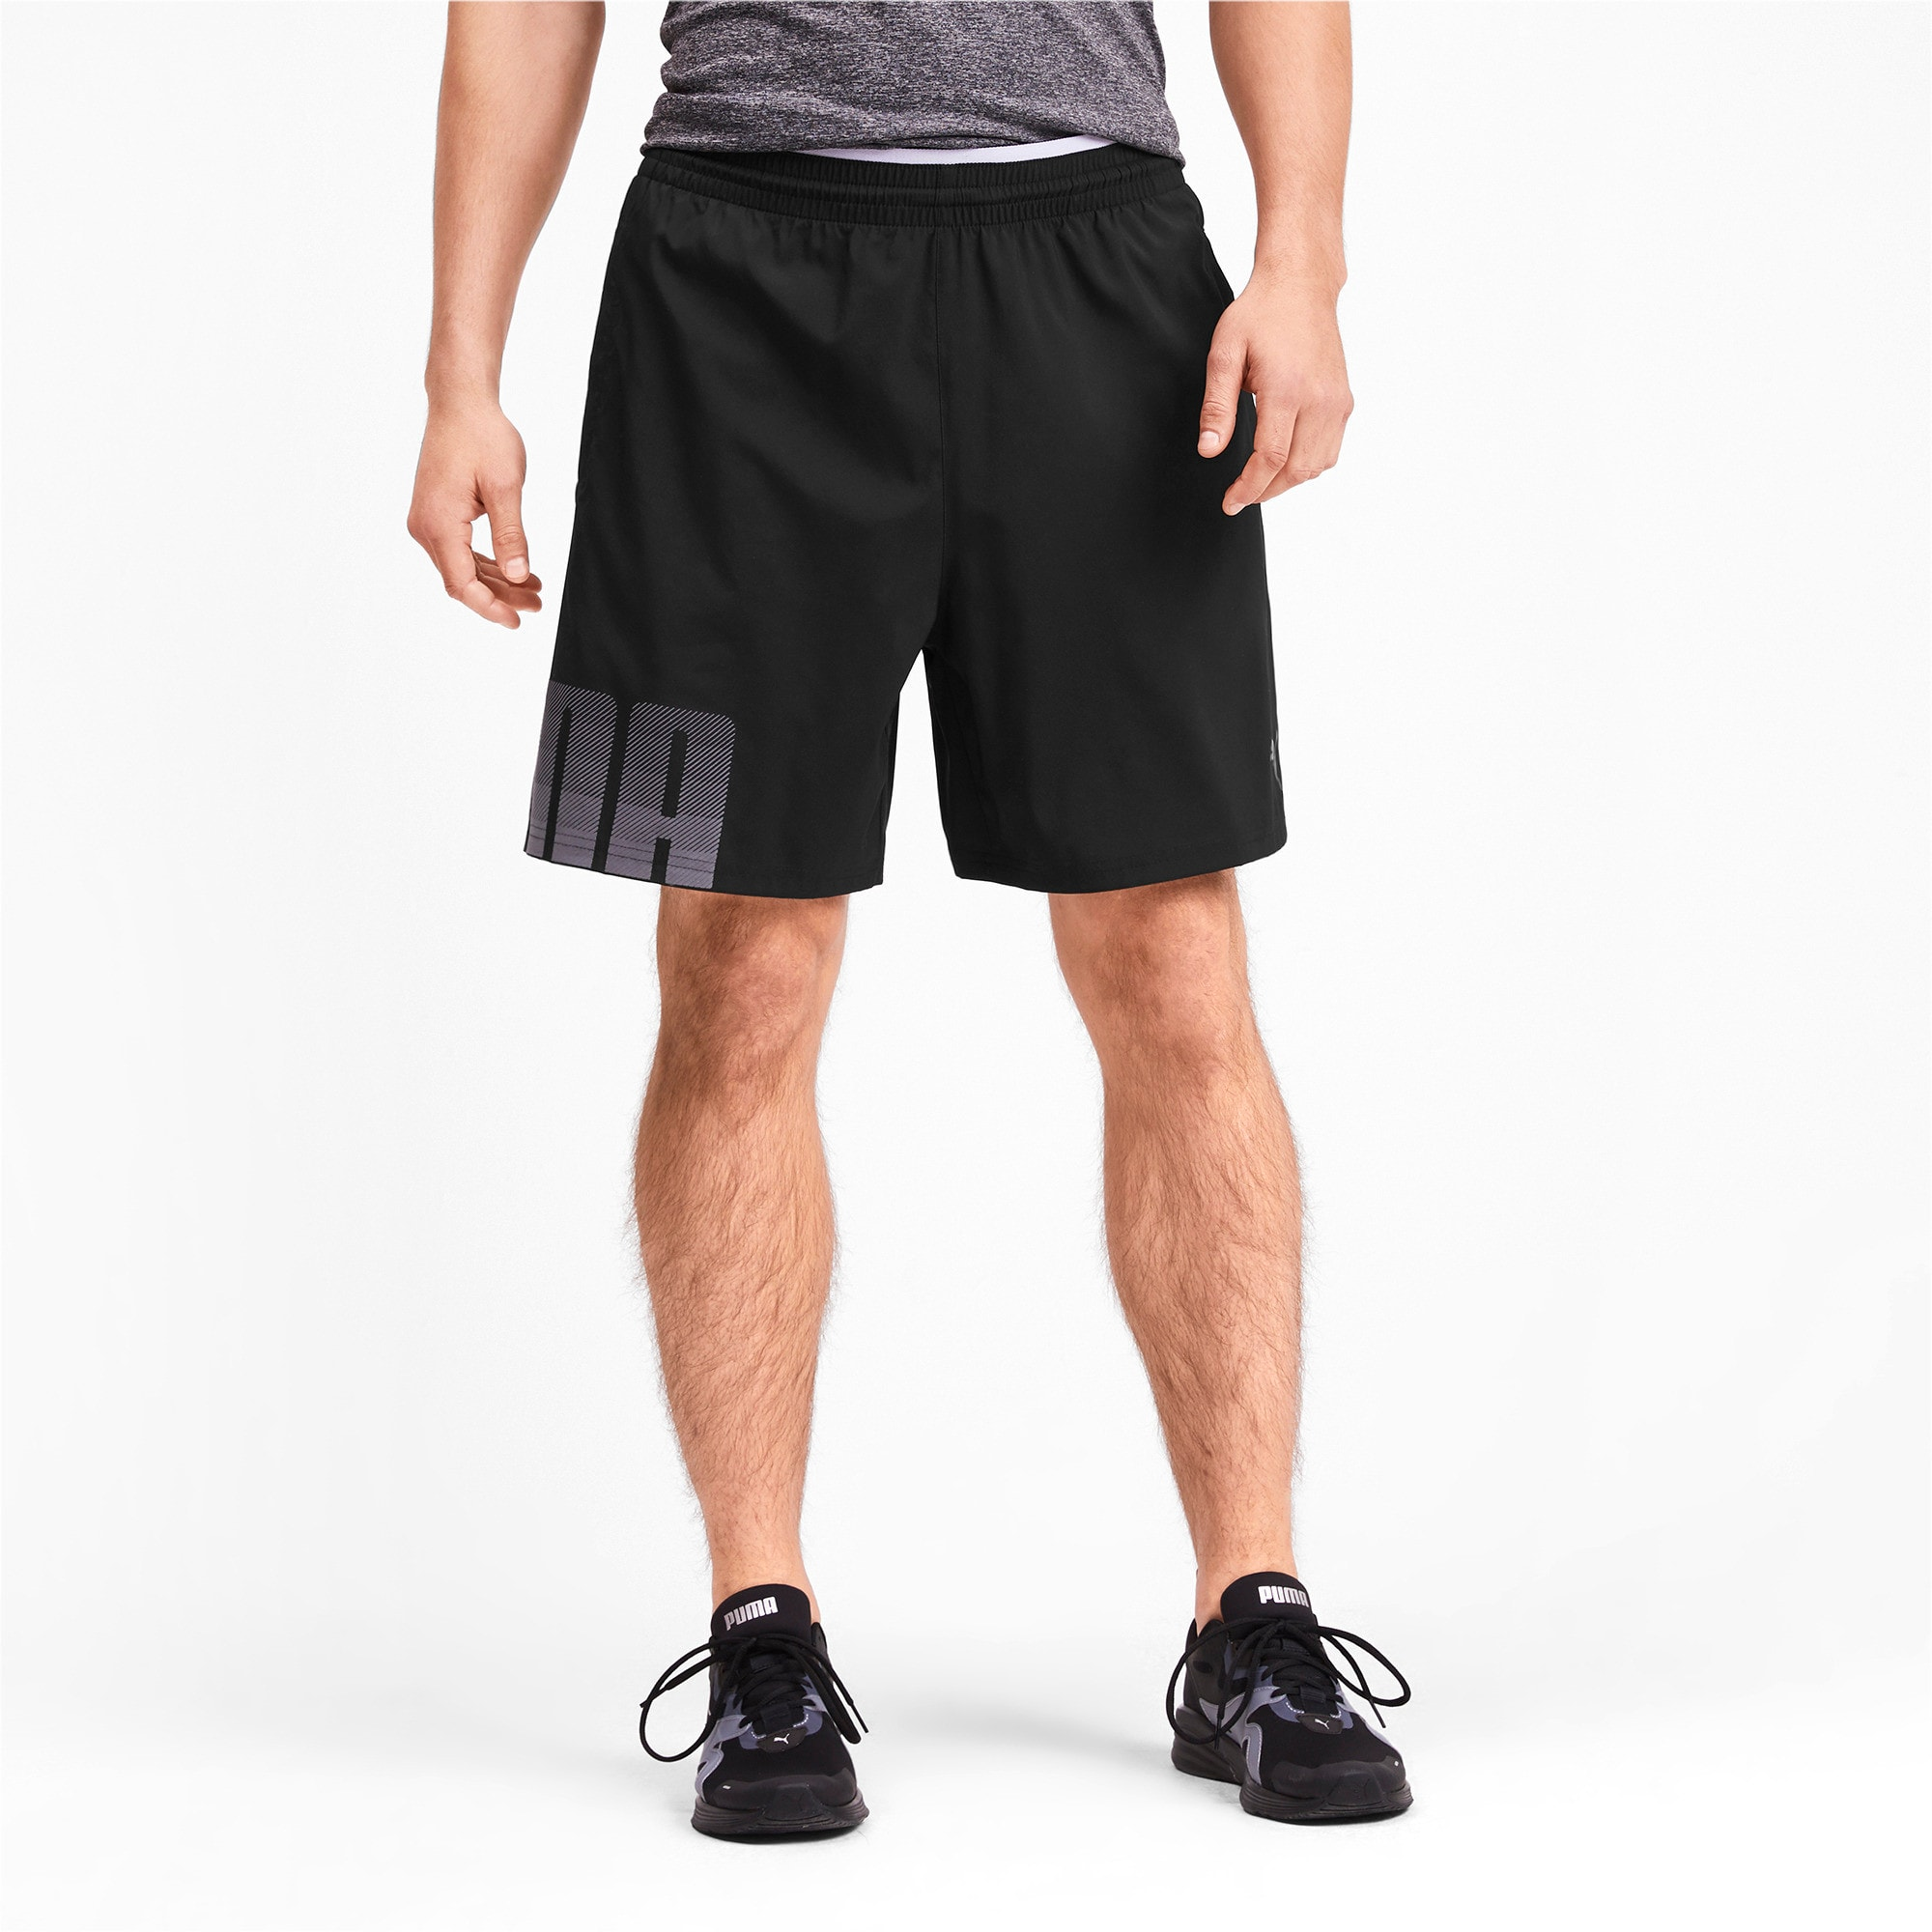 Thumbnail 1 of Collective Woven Men's Training Shorts, Puma Black, medium-IND